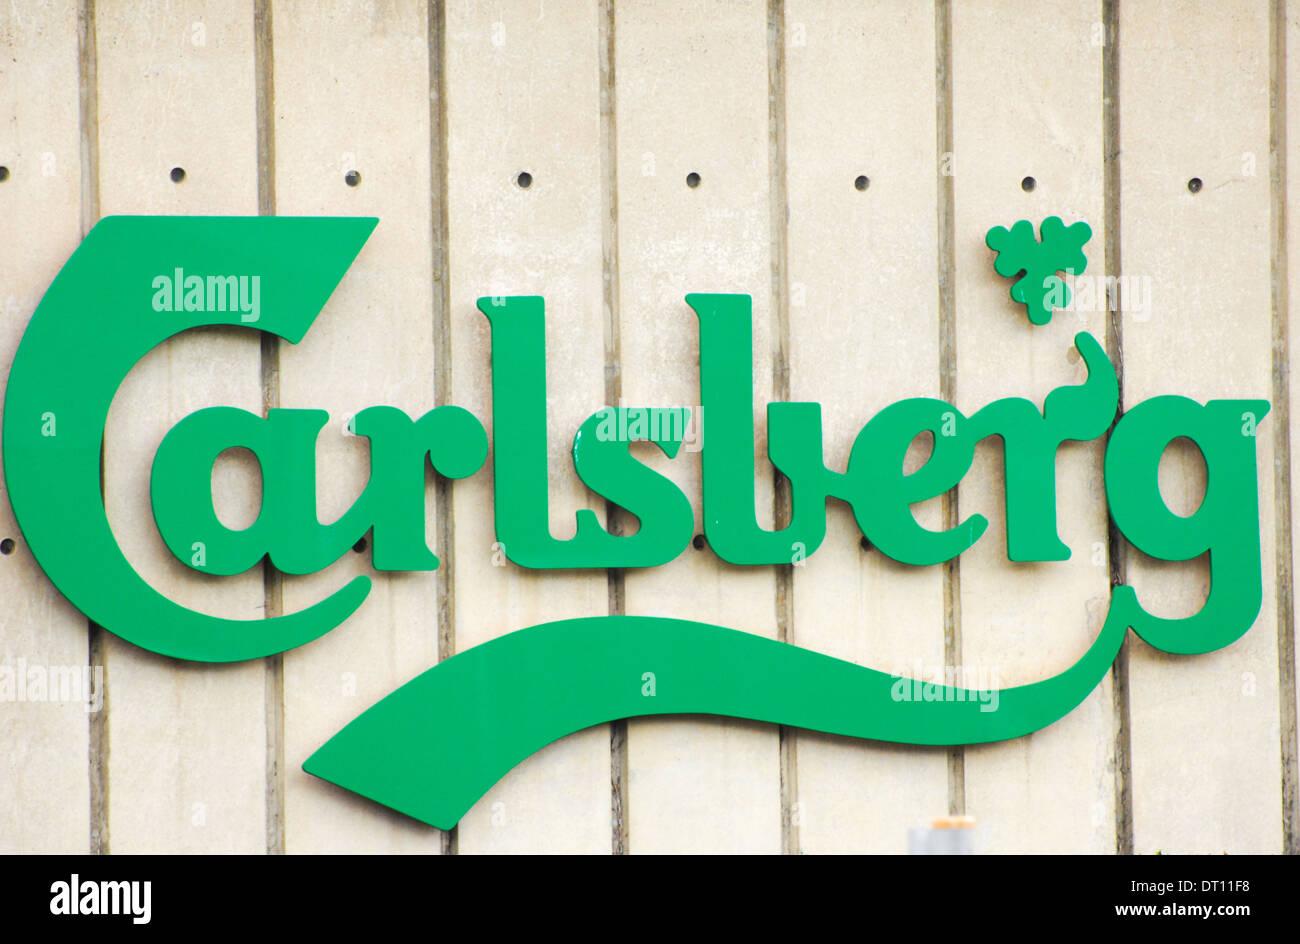 Carlsberg factory sign - Stock Image